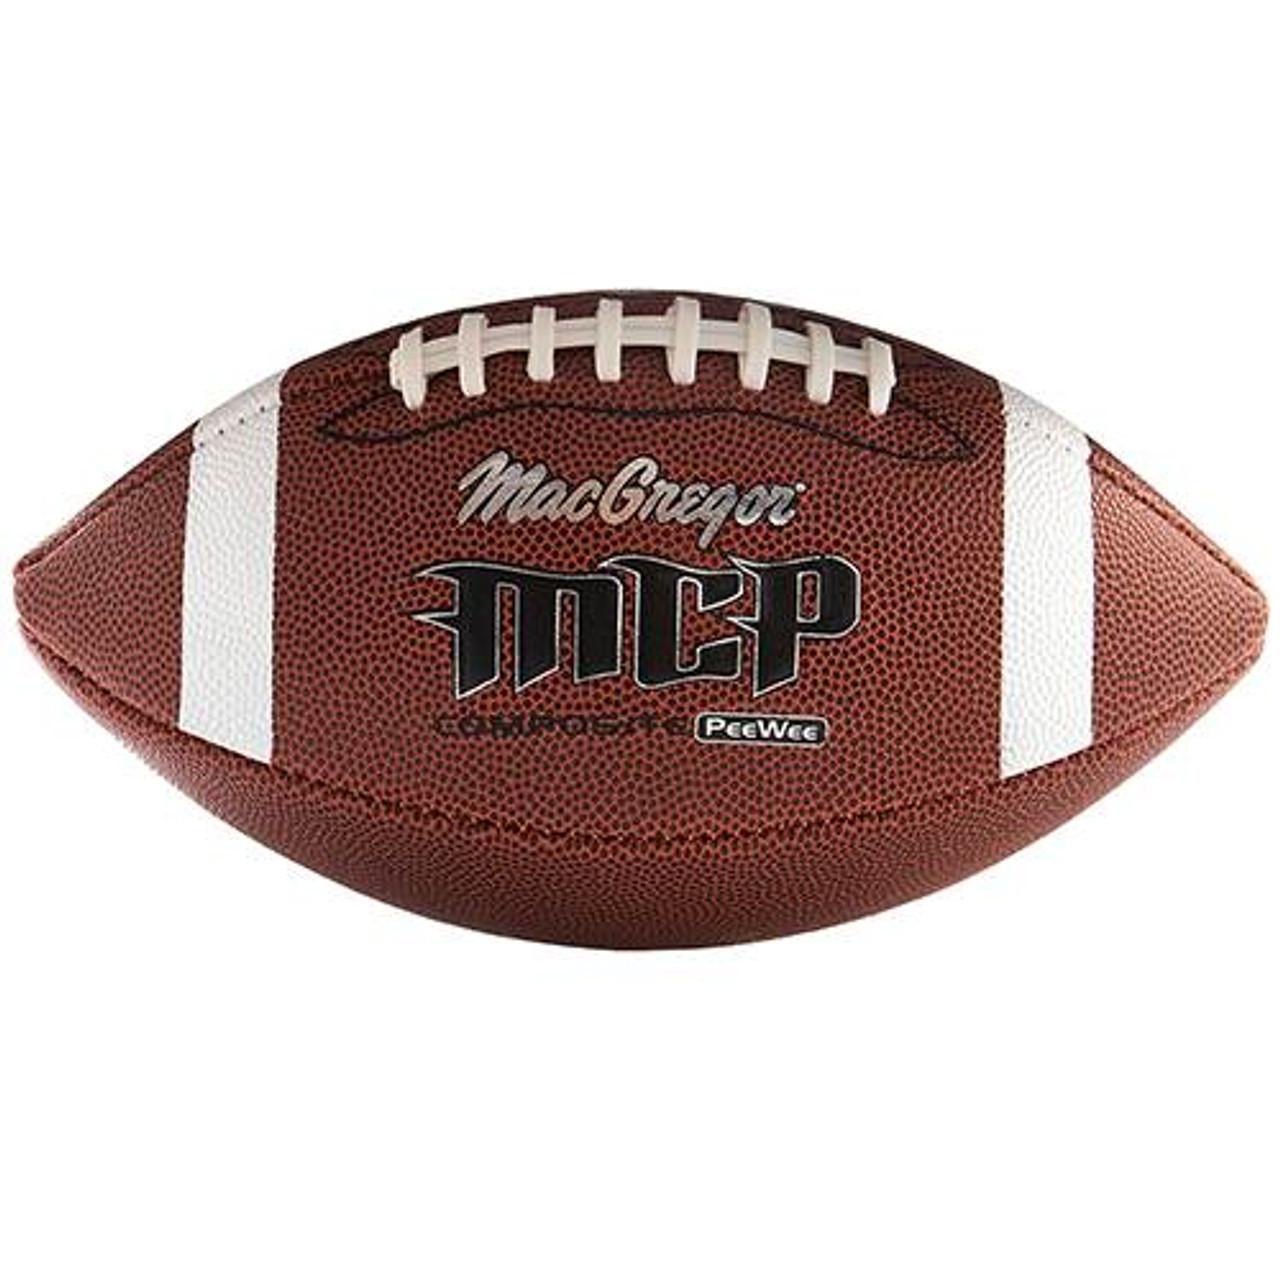 MacGregor MC Composite Football - PeeWee, 6-9